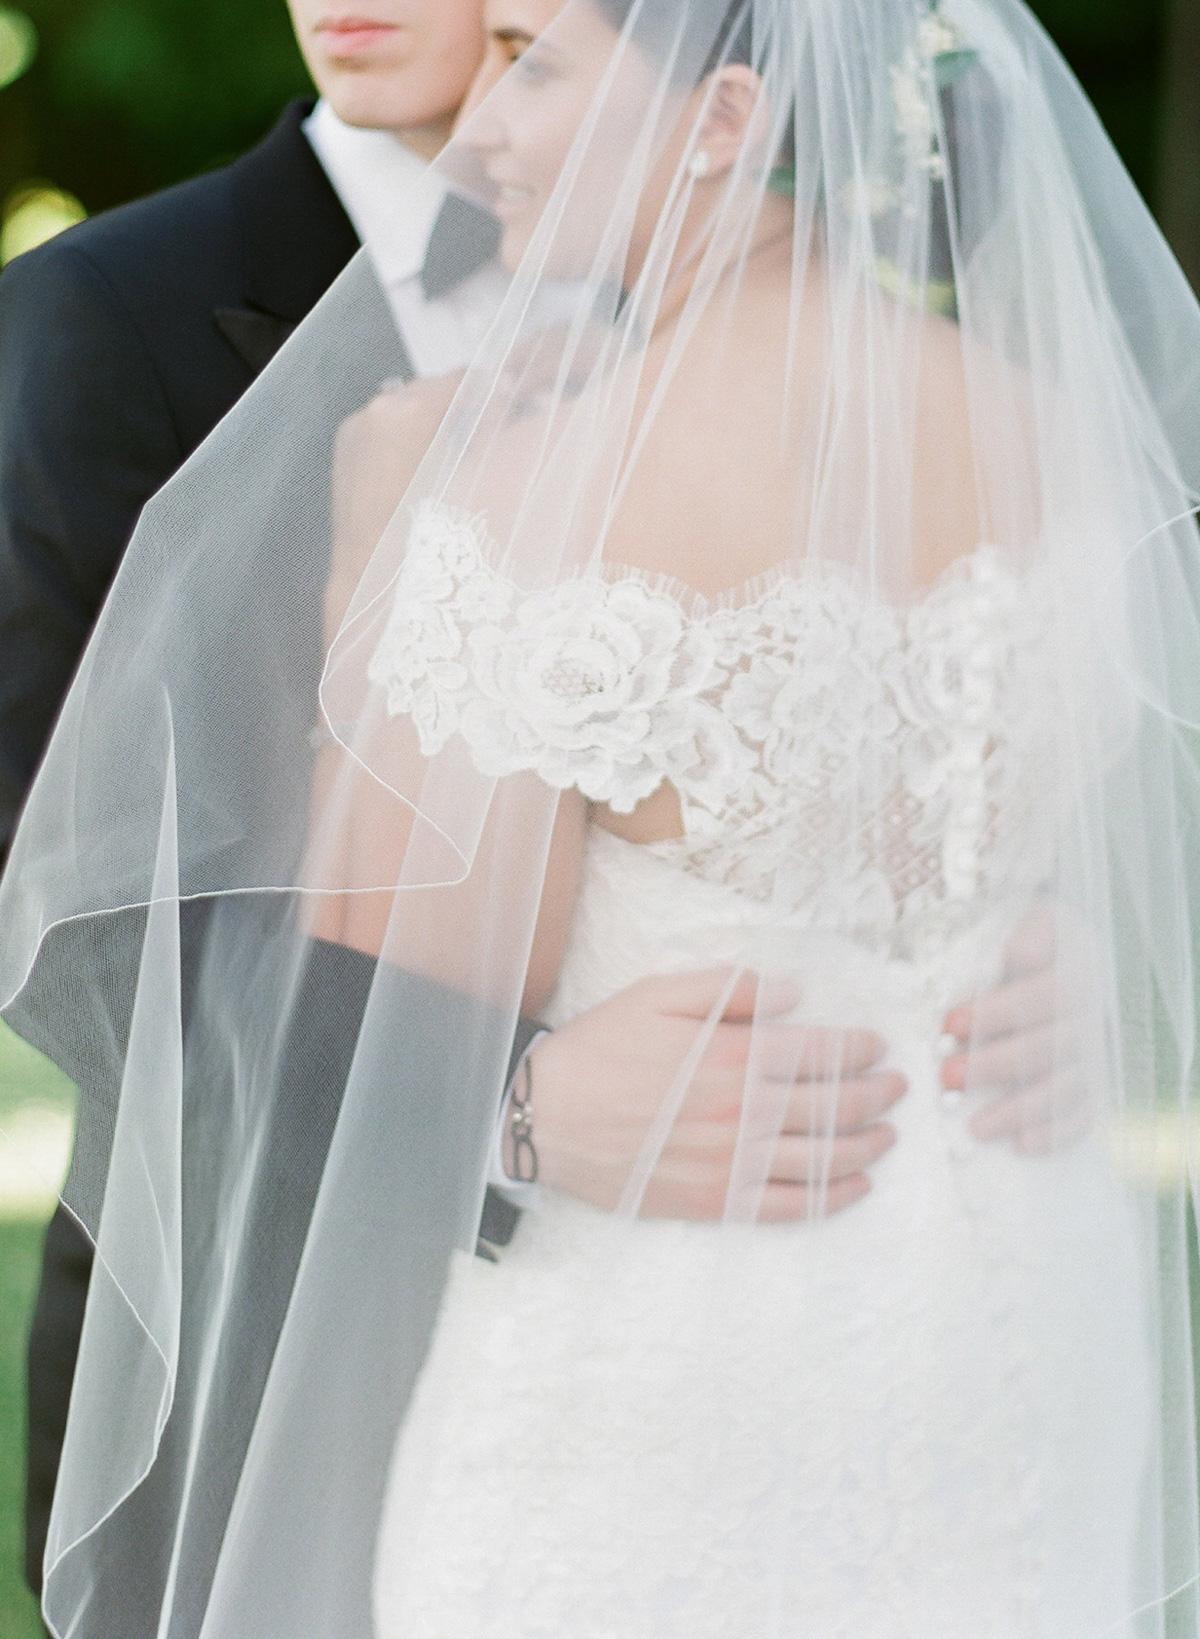 artiese-studios-vineyard-bride-swish-list-private-estate-cambridge-wedding-66.jpg